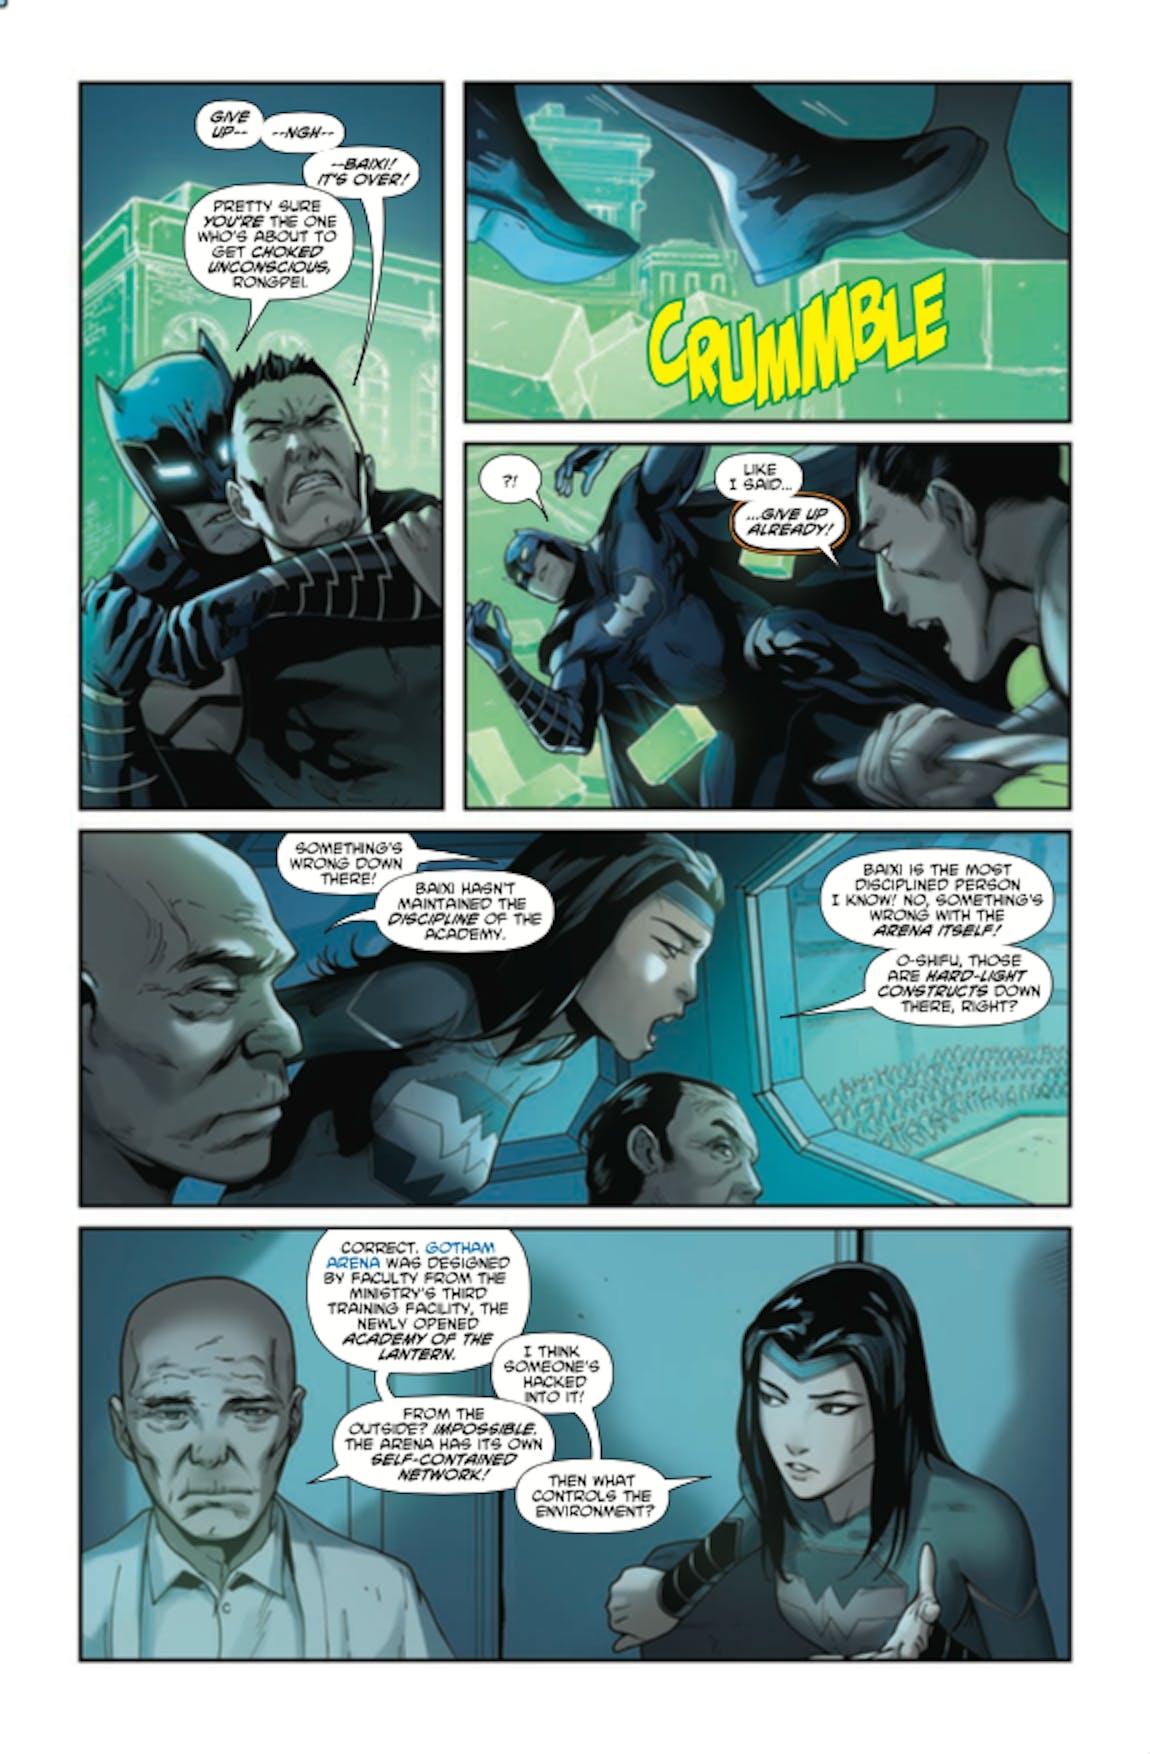 Chinese Green Lantern Batman DC Comics New Super-Man